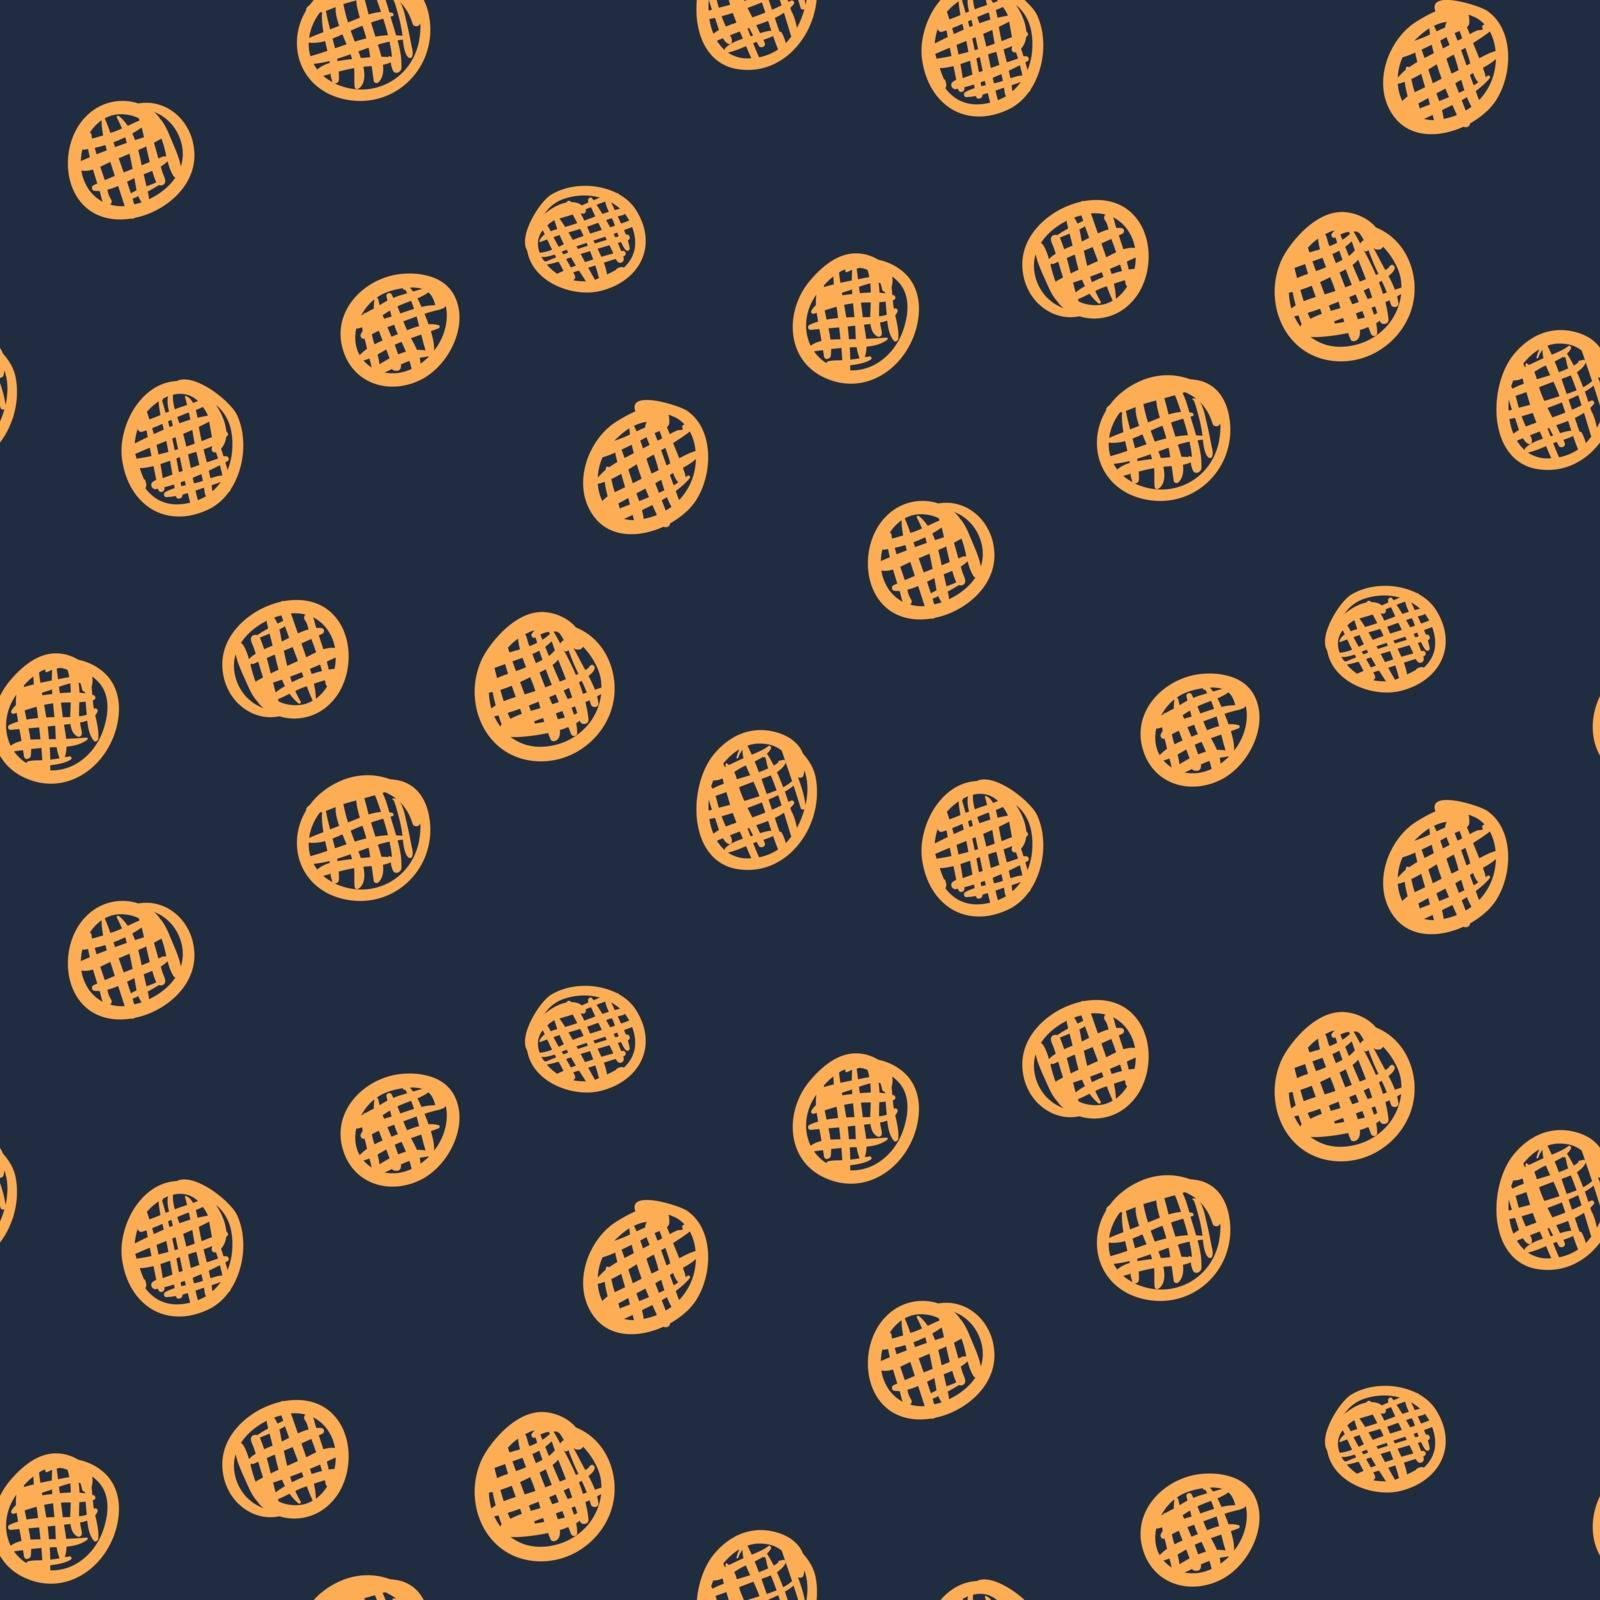 Dark abstract seamless pattern with orange circles